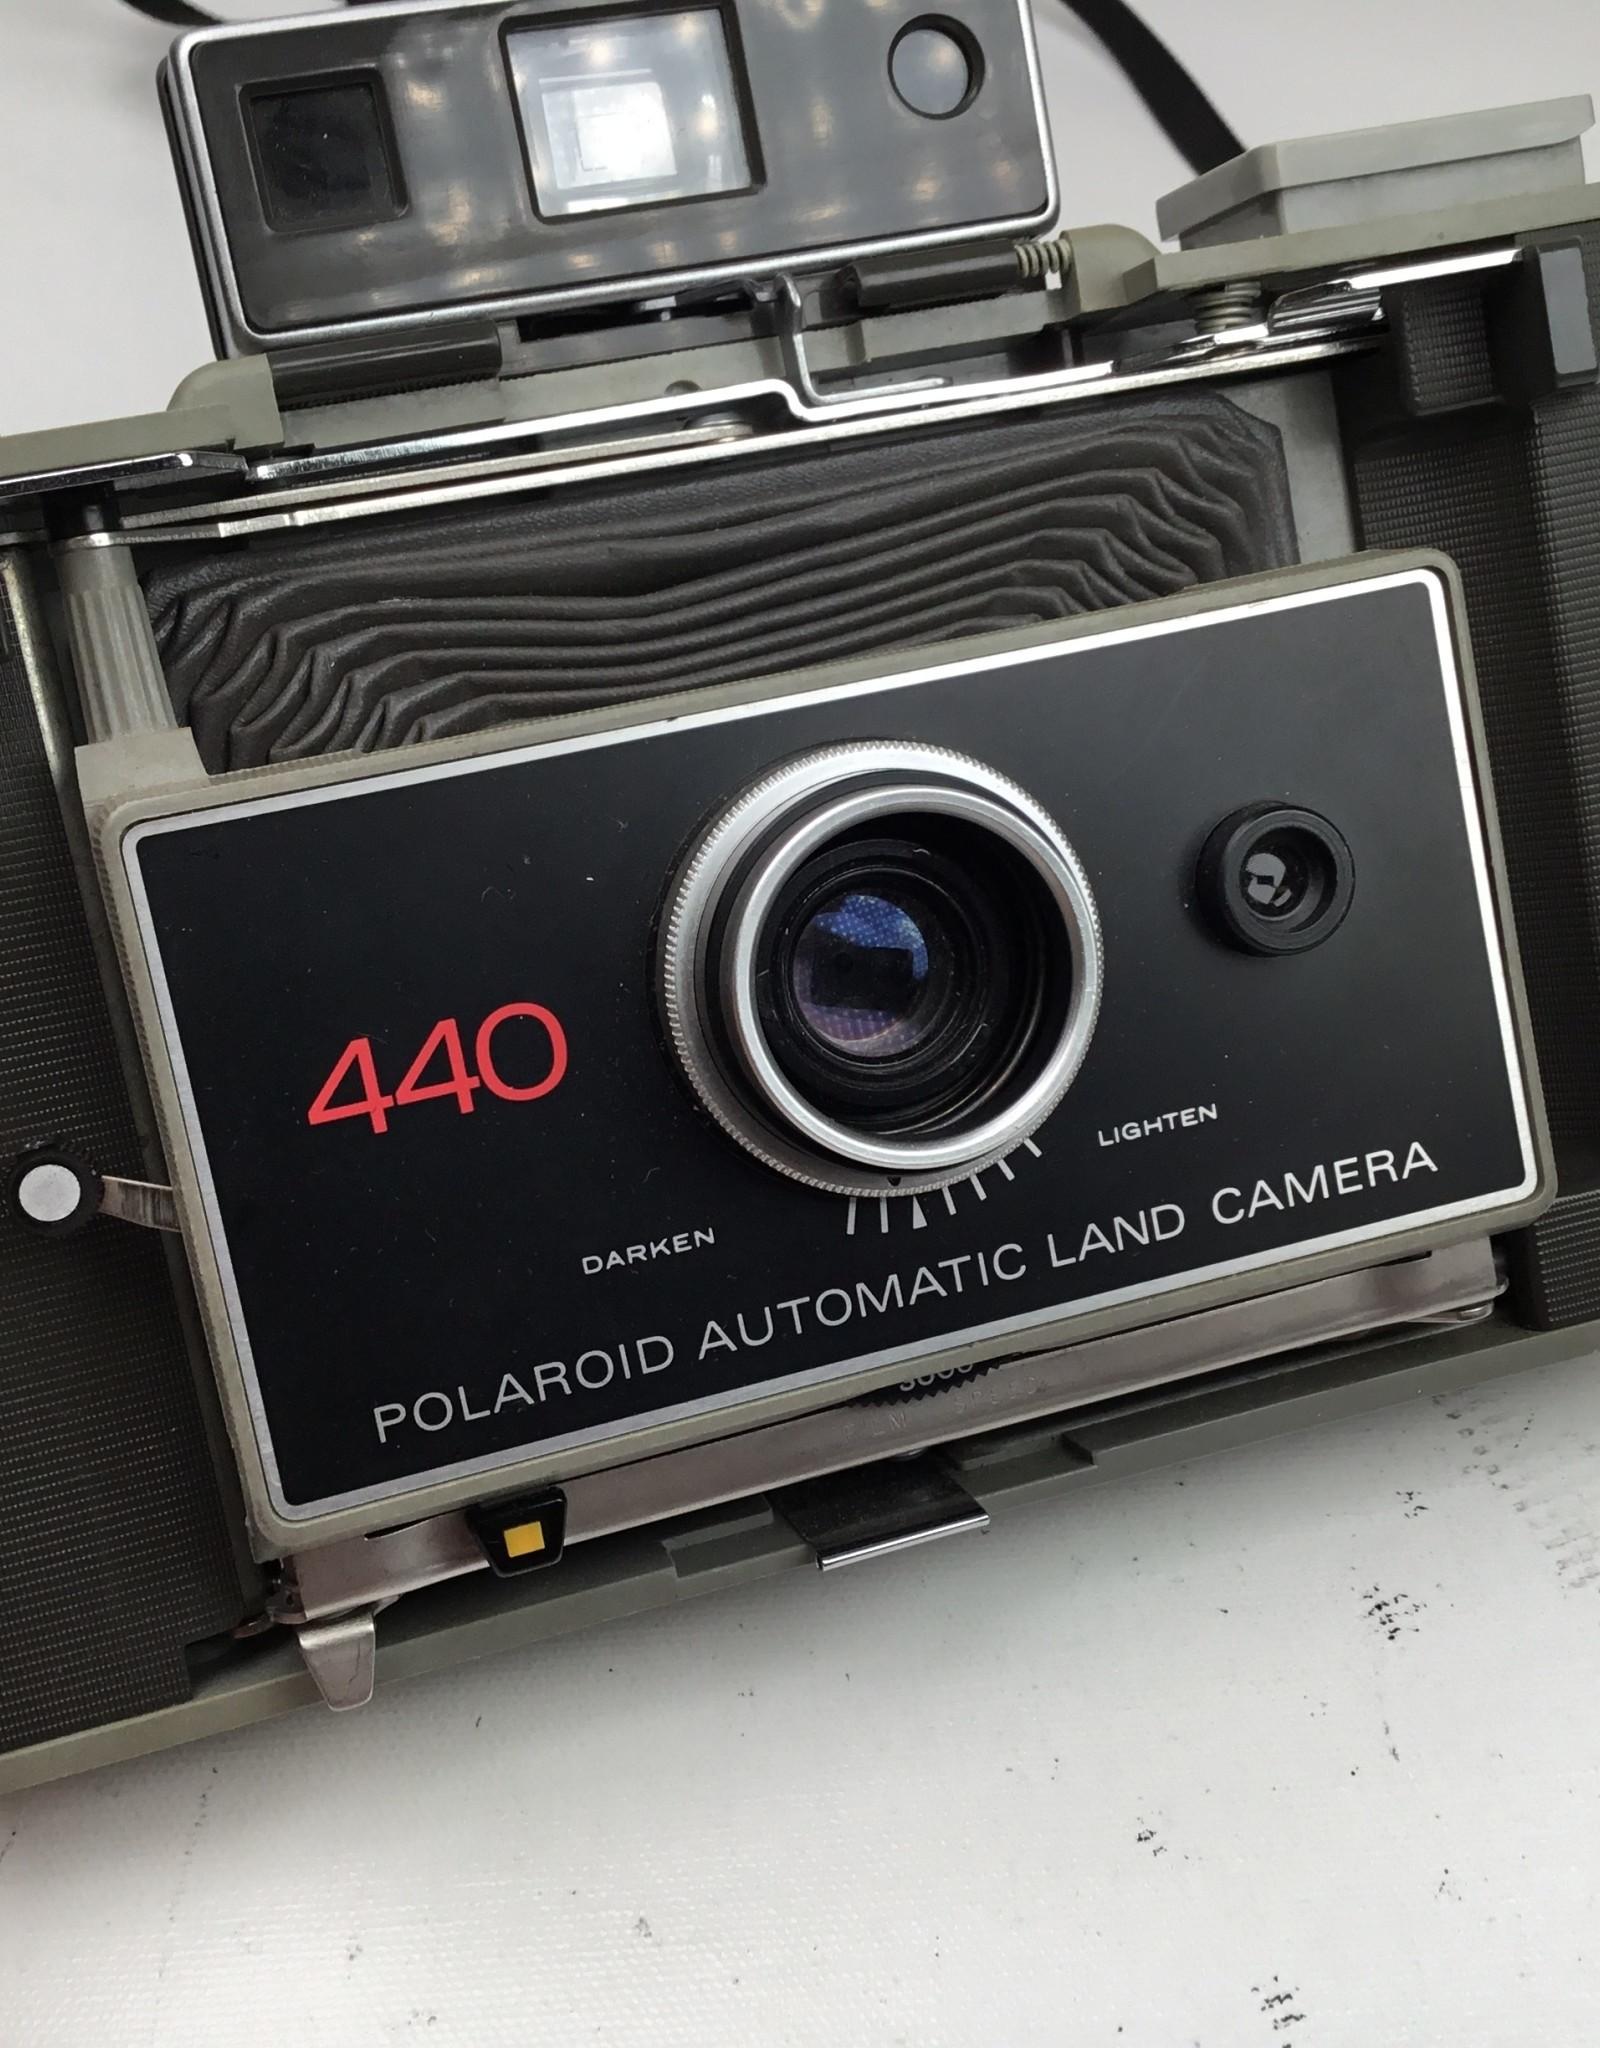 POLAROID Polaroid 440 Camera Used Disp